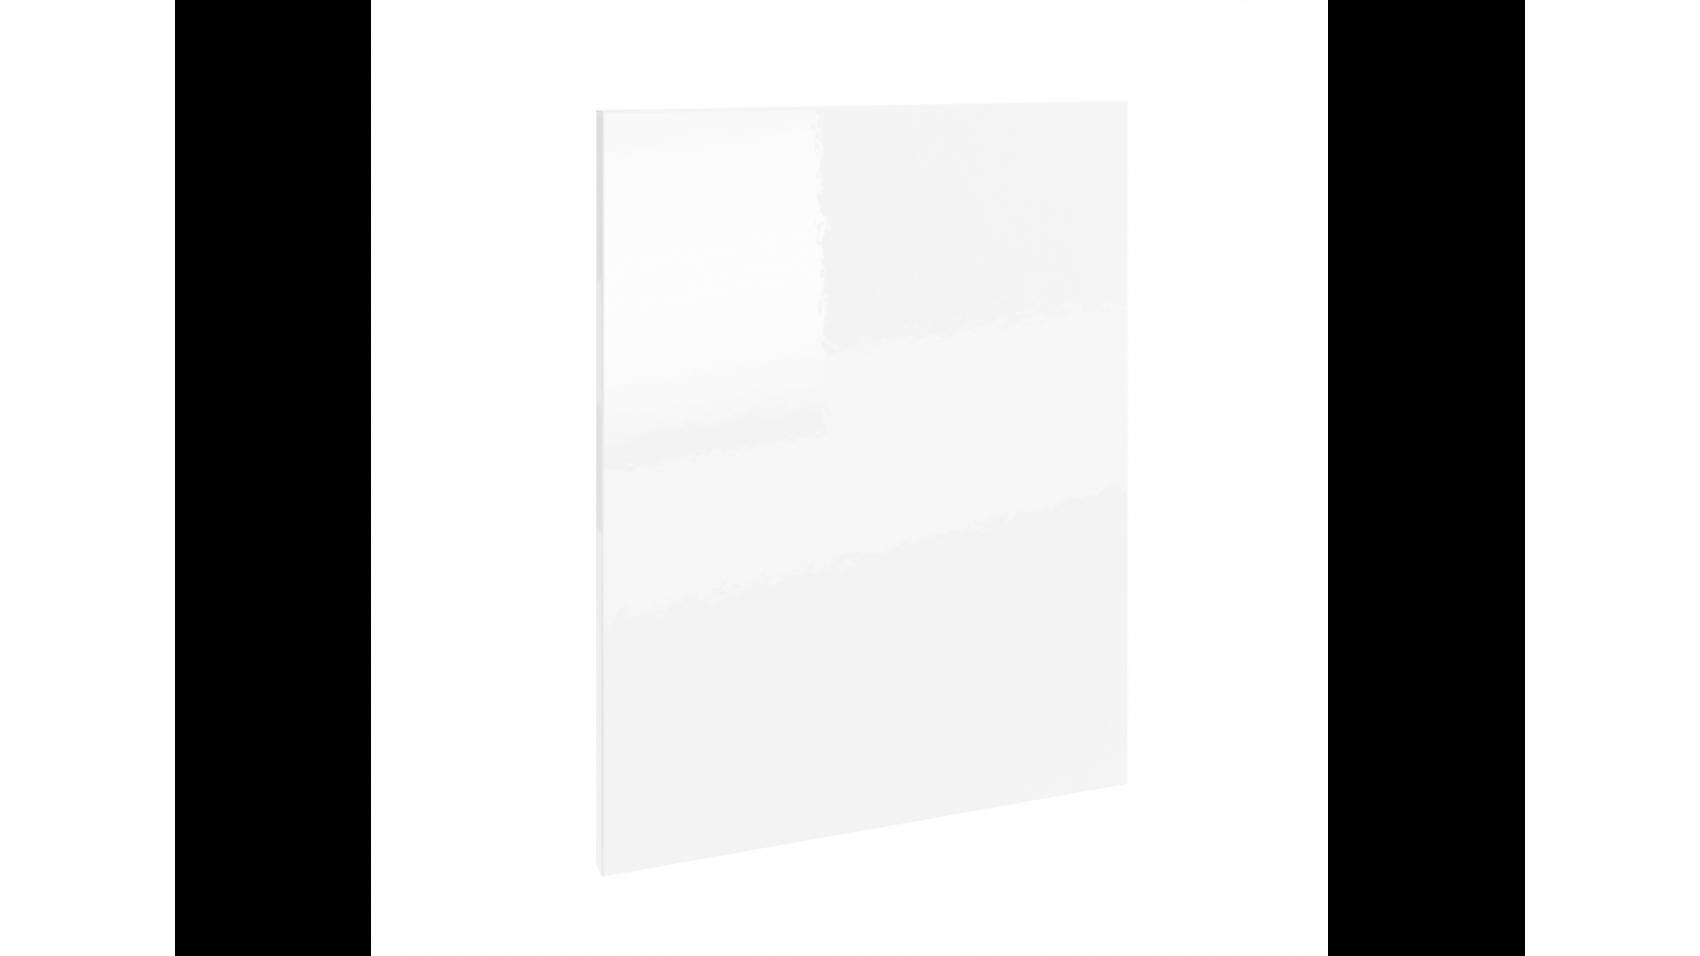 Kuchenne Elementy Dodatkowe Luna White | sklep internetowy Lupus ECO